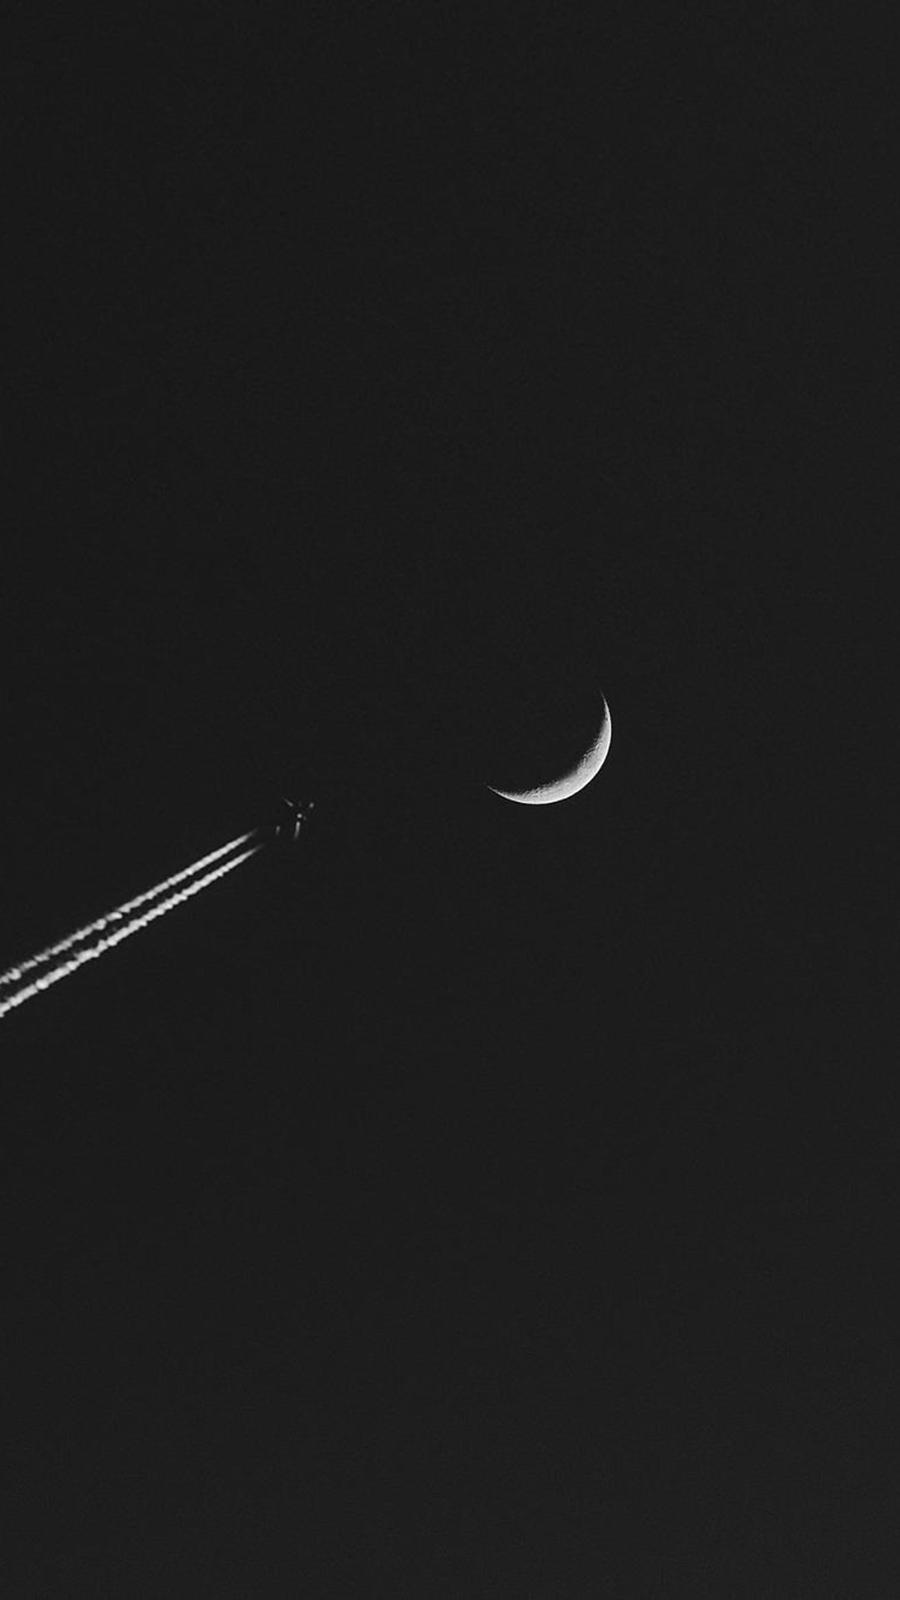 Airplane Moon Minimalism Wallpaper